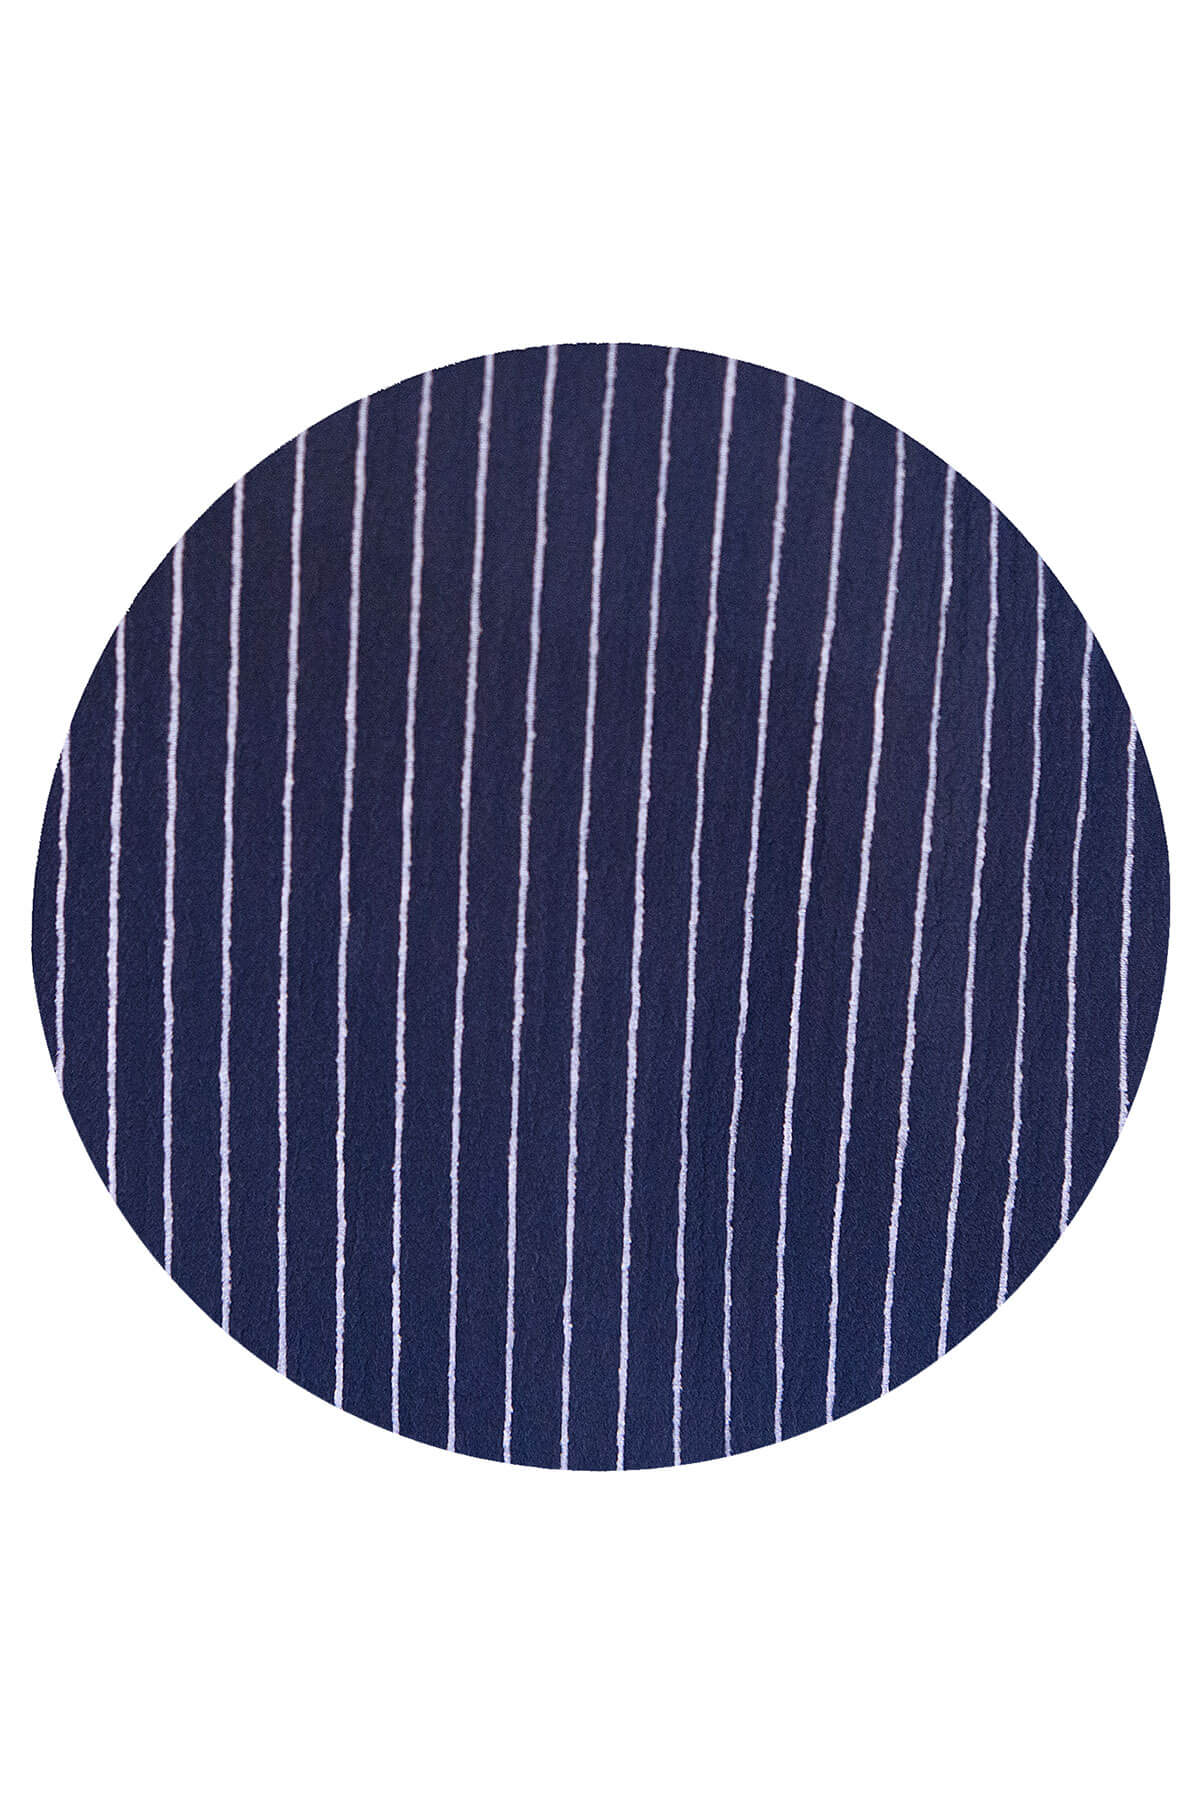 Grizas striped top